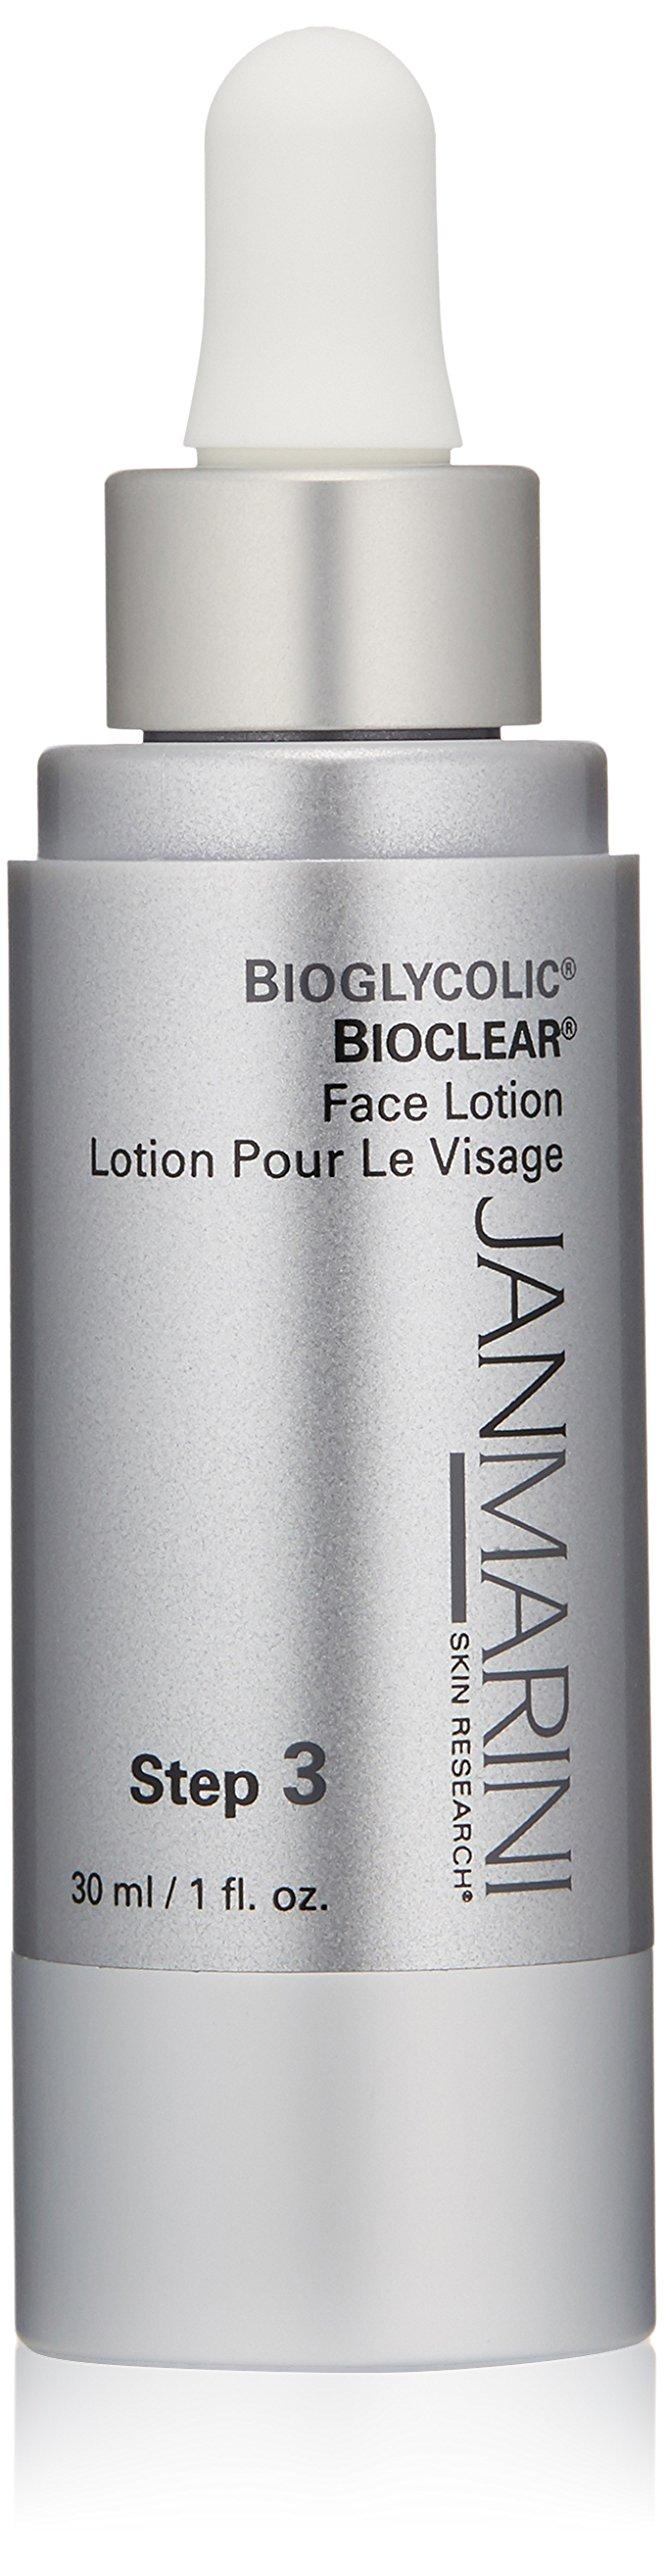 Jan Marini Skin Research Bioglycolic Bioclear Face Lotion, 1 fl. oz.